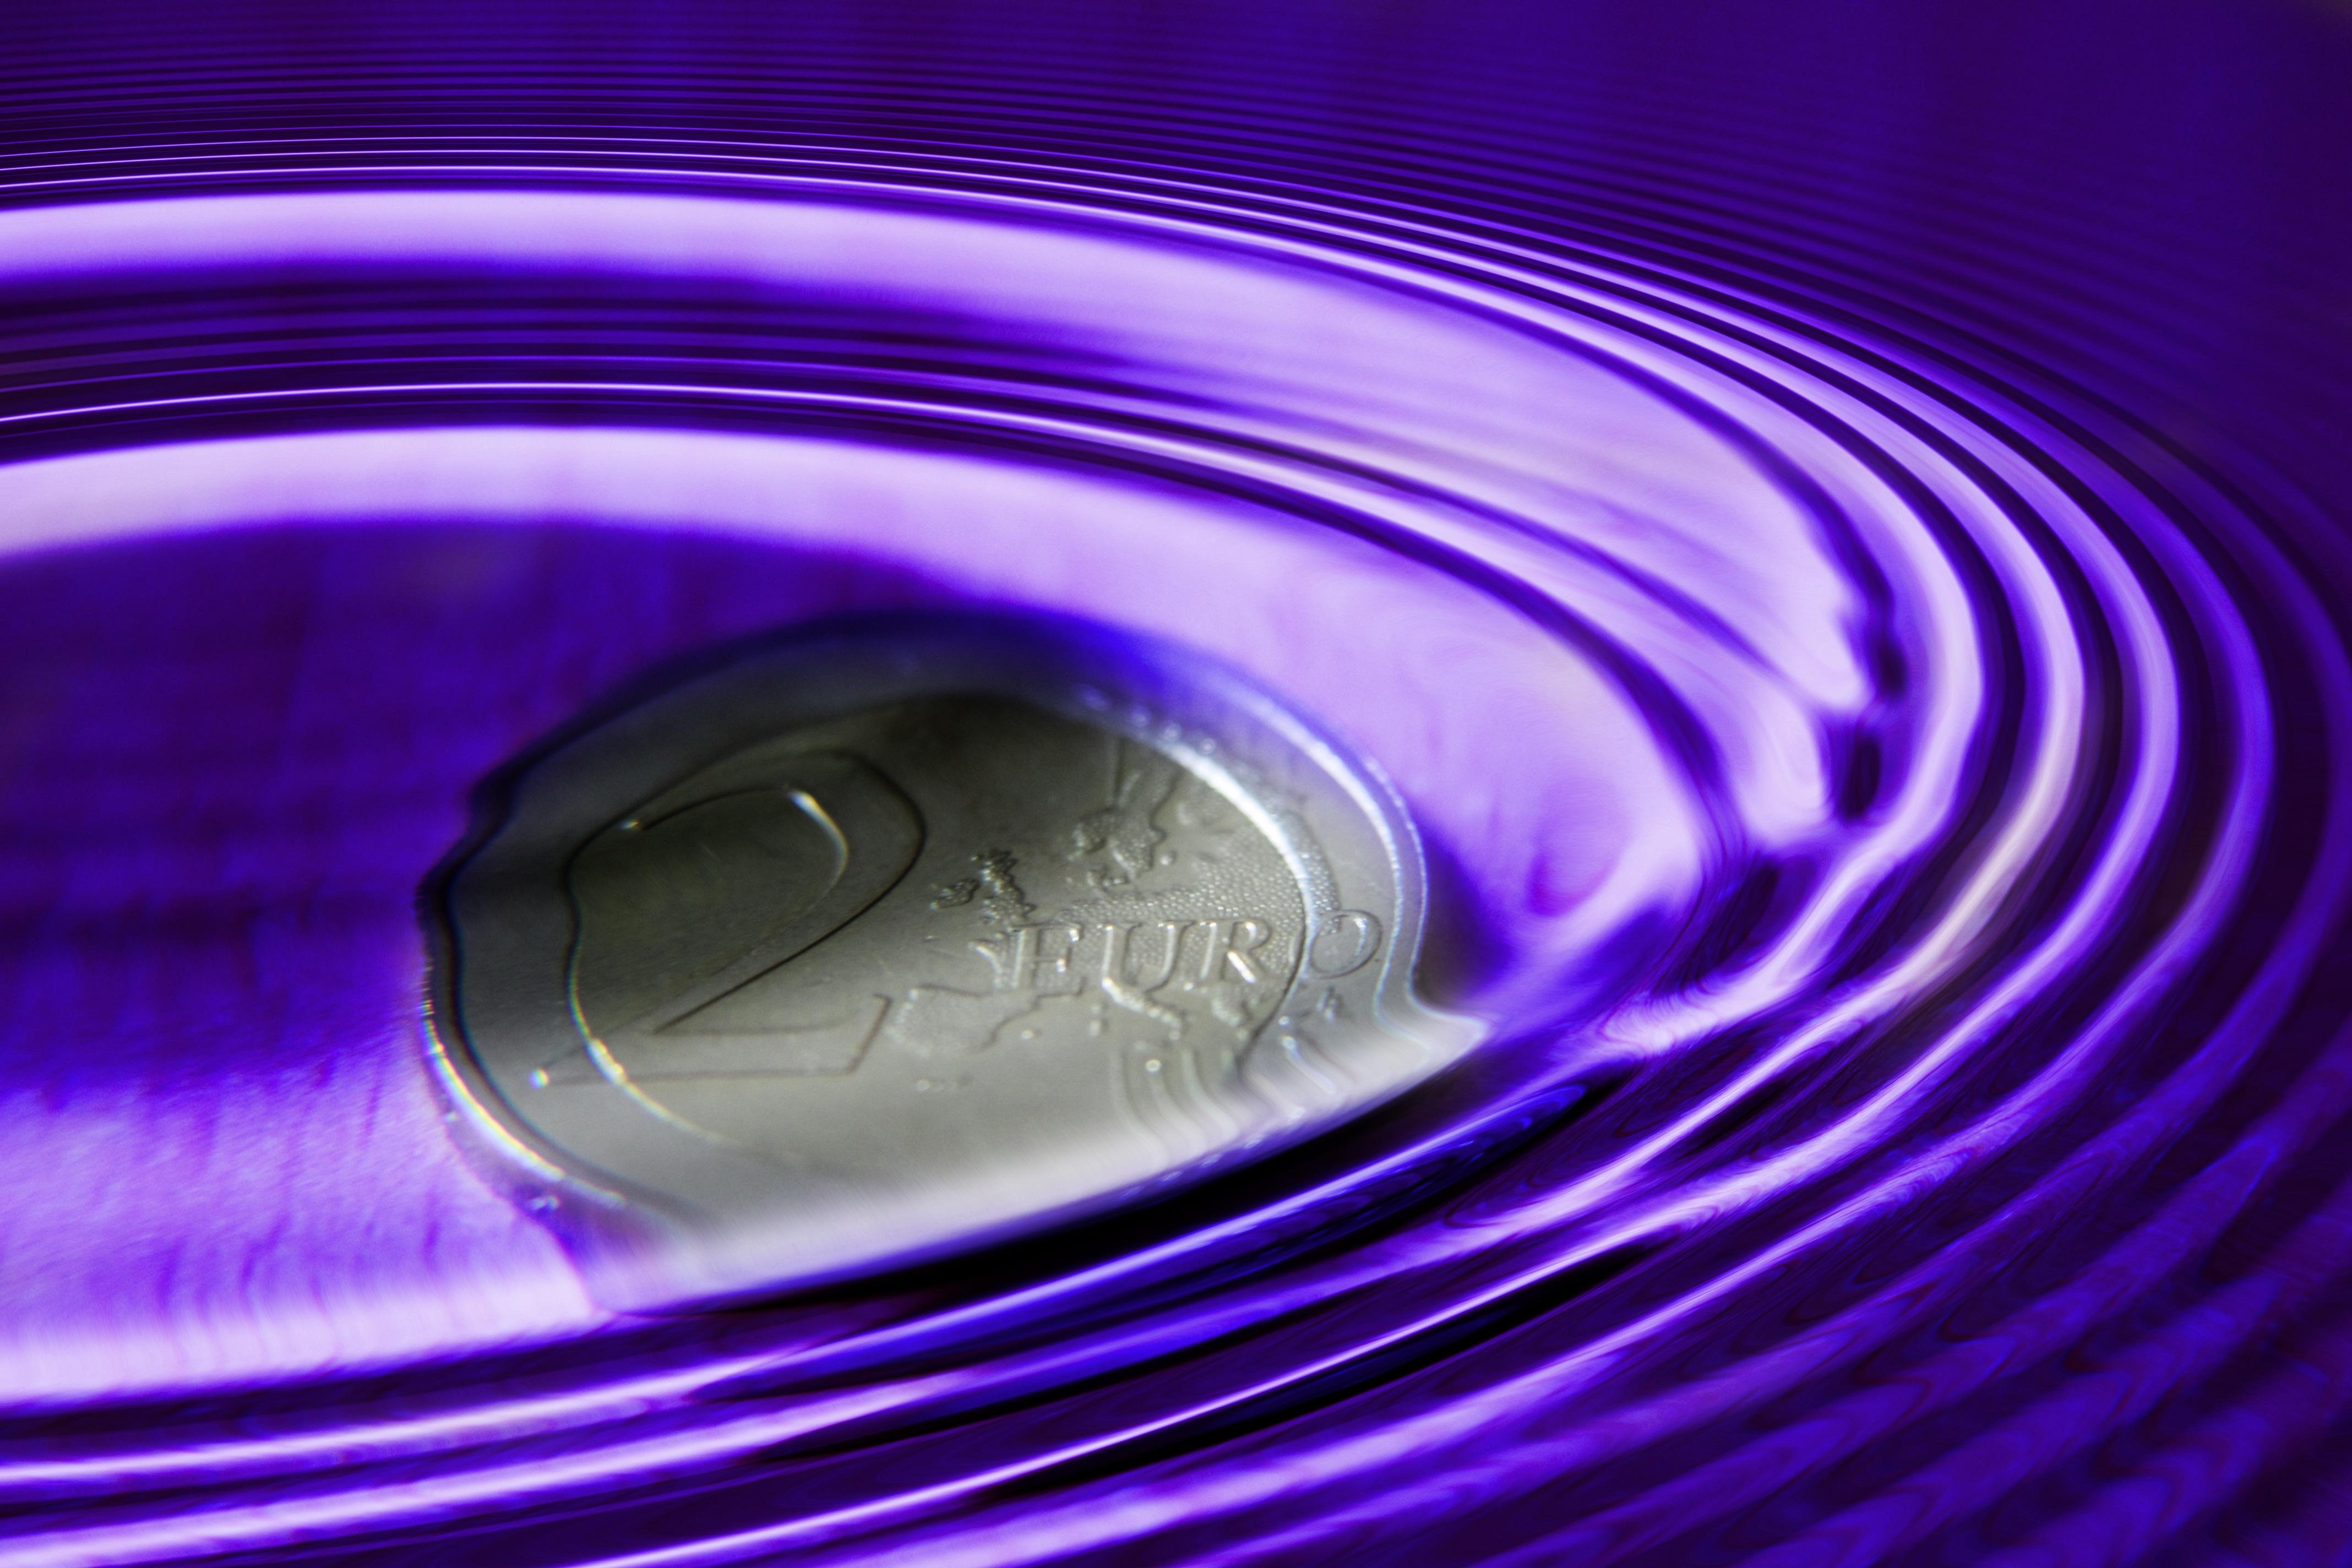 Gambar Air Batu Penurunan Cahaya Struktur Tekstur